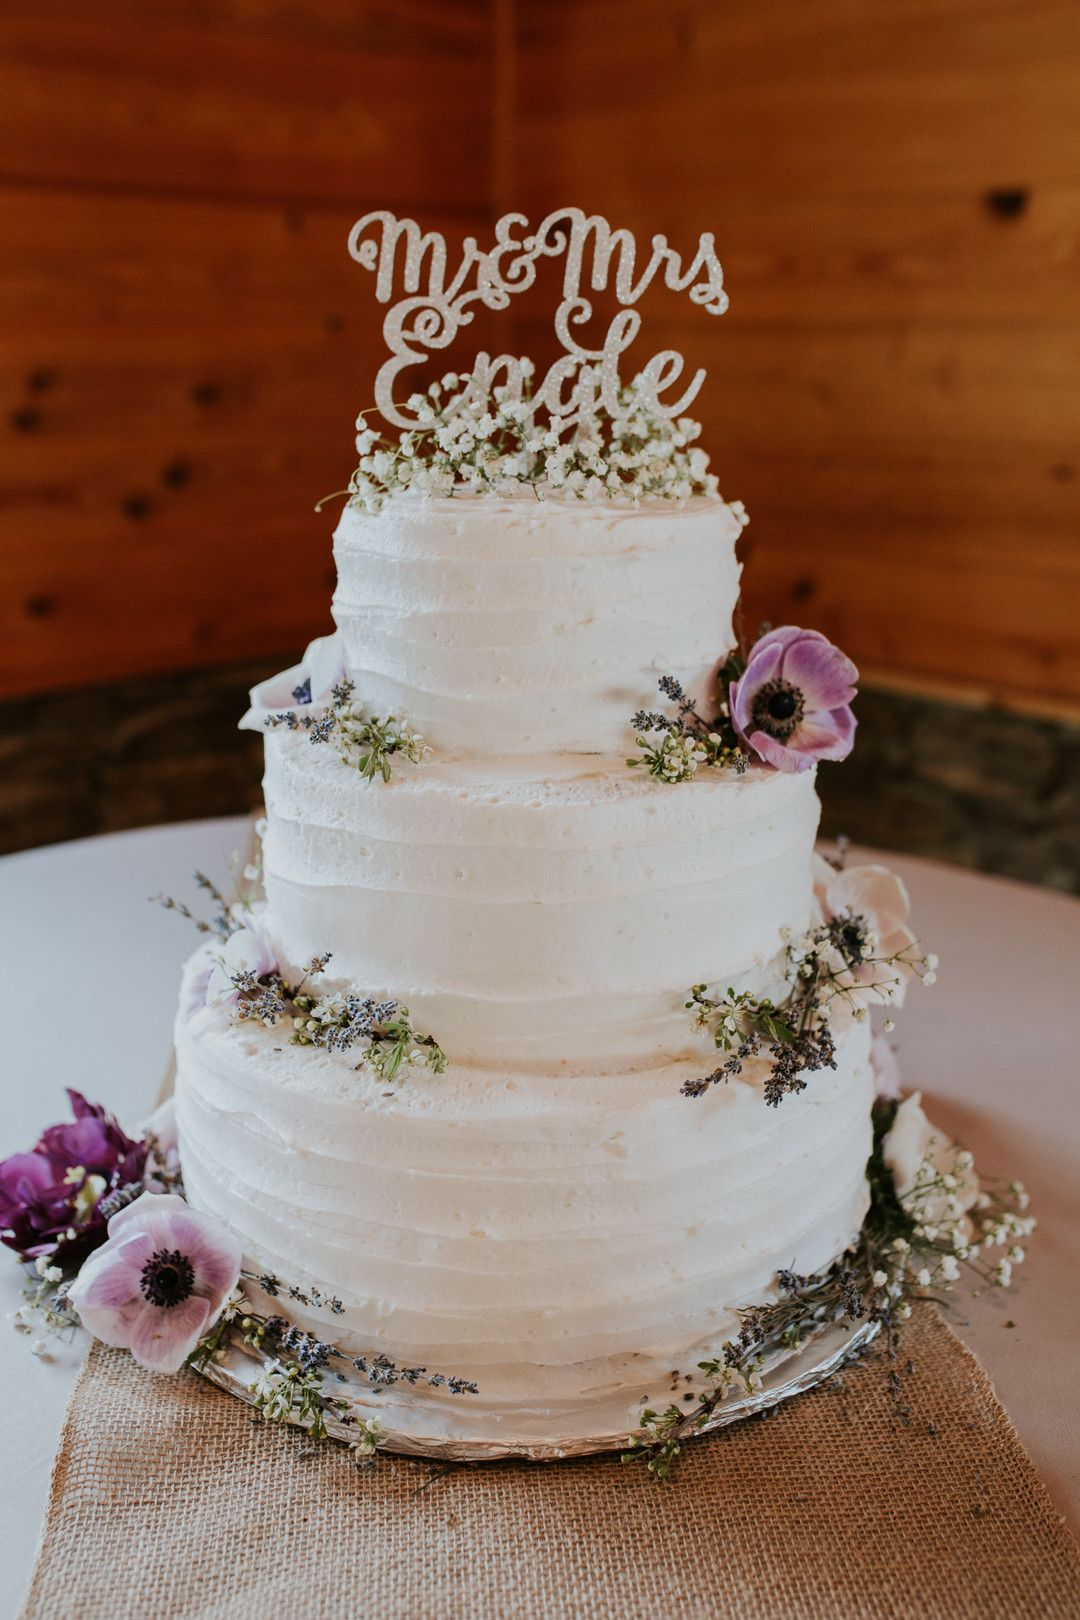 Rustic Wedding Cakes Weddingcake In 2020 Wedding Cake Rustic